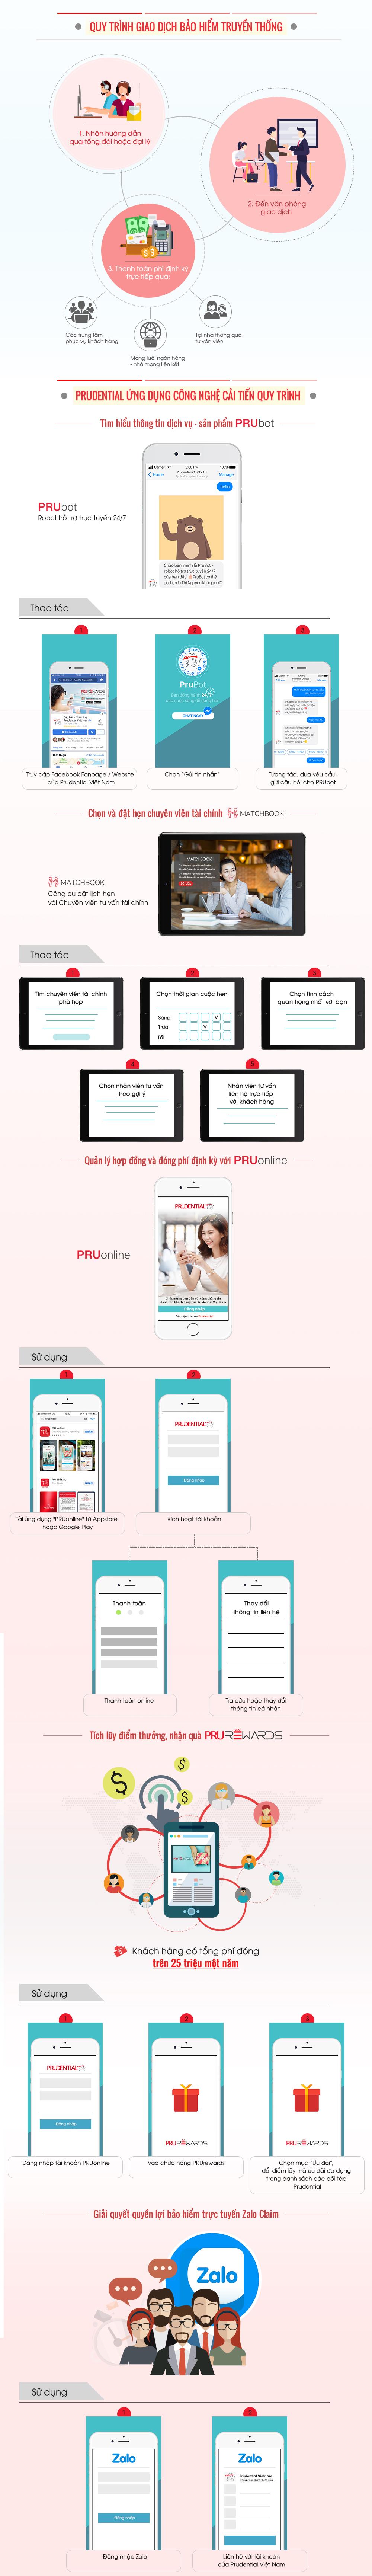 Những giải pháp giao dịch trực tuyến của Prudential